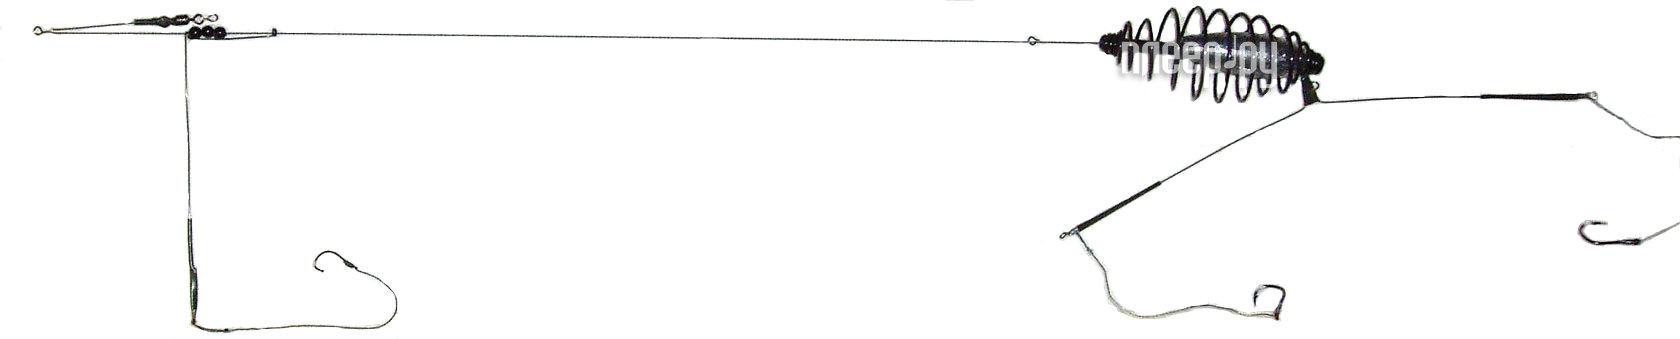 Кормушка Deepriver 35гр, крючок №6 OD-03-035-06